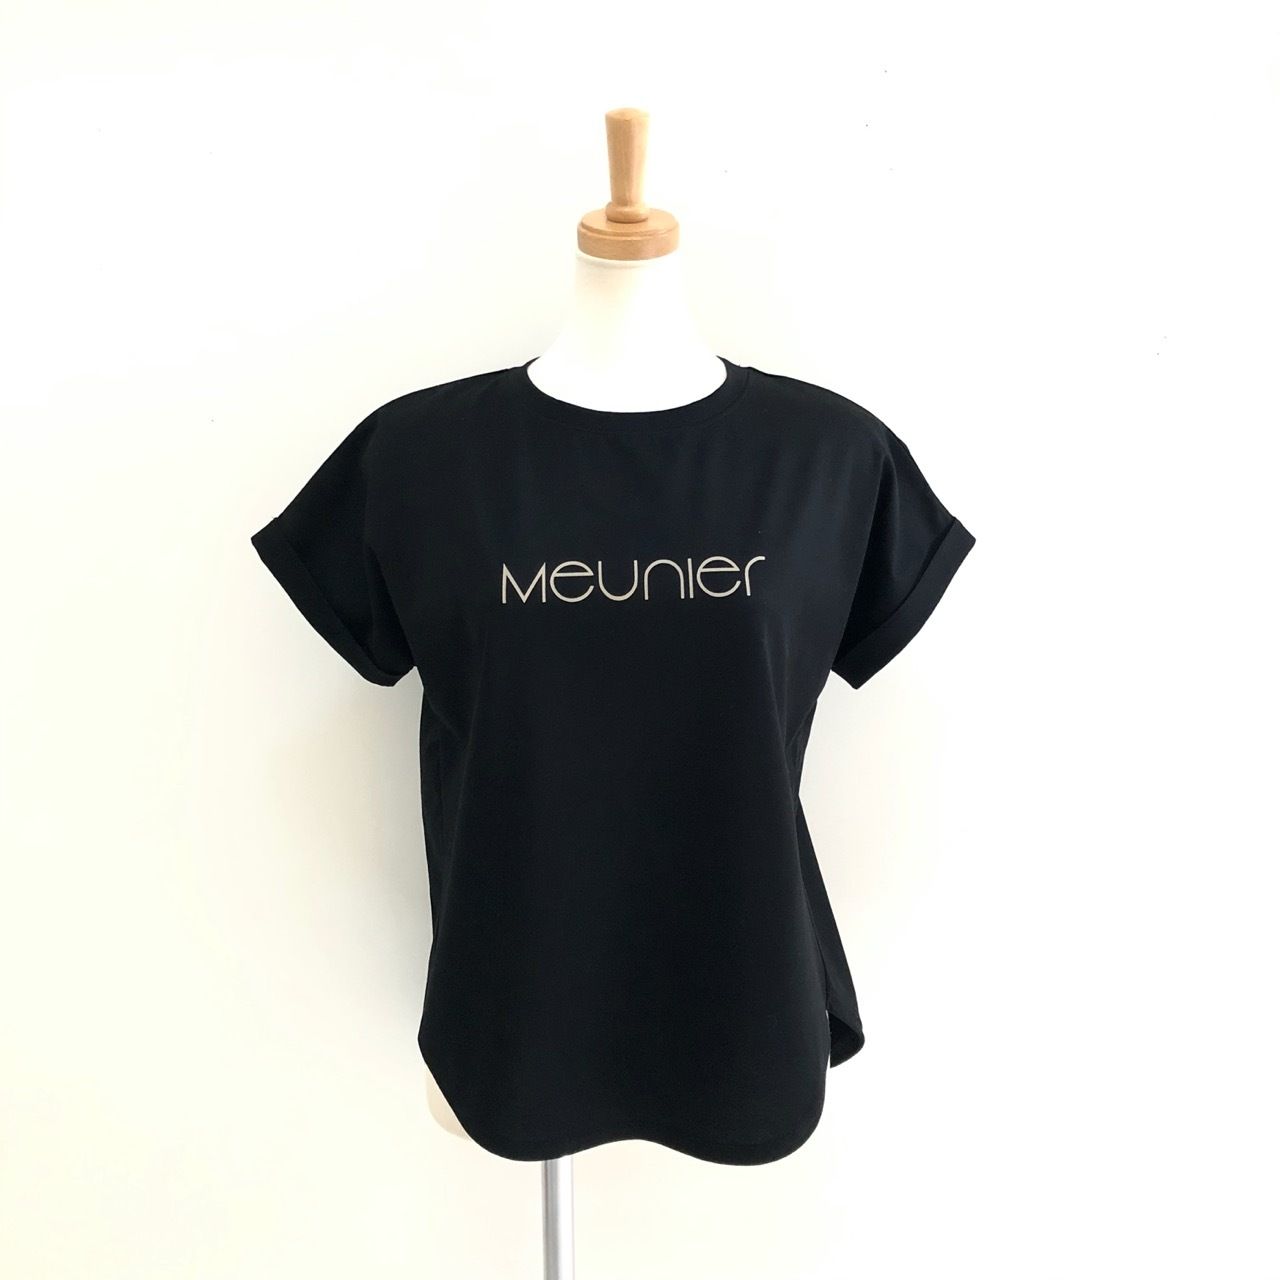 【 QTUME 】- 012-25165 - プリントTシャツ